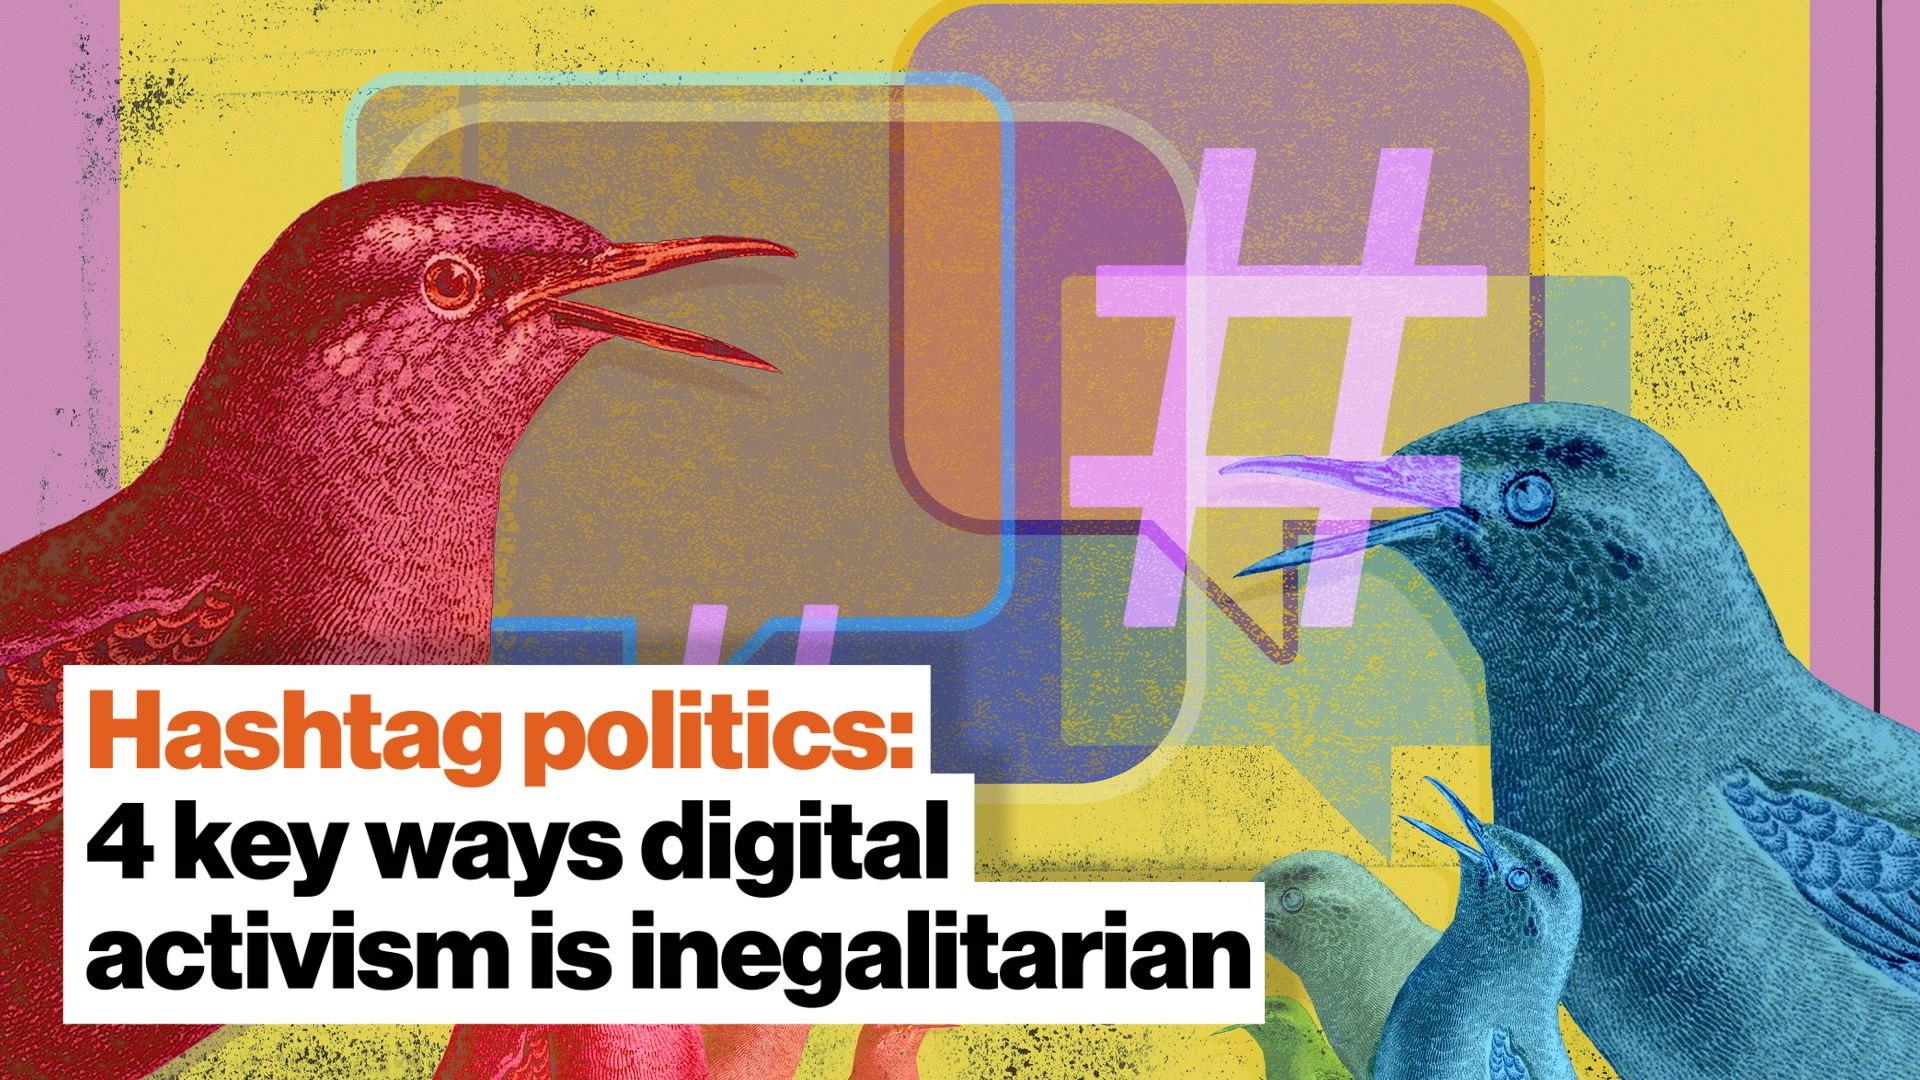 Hashtag politics: 4 key ways digital activism is inegalitarian